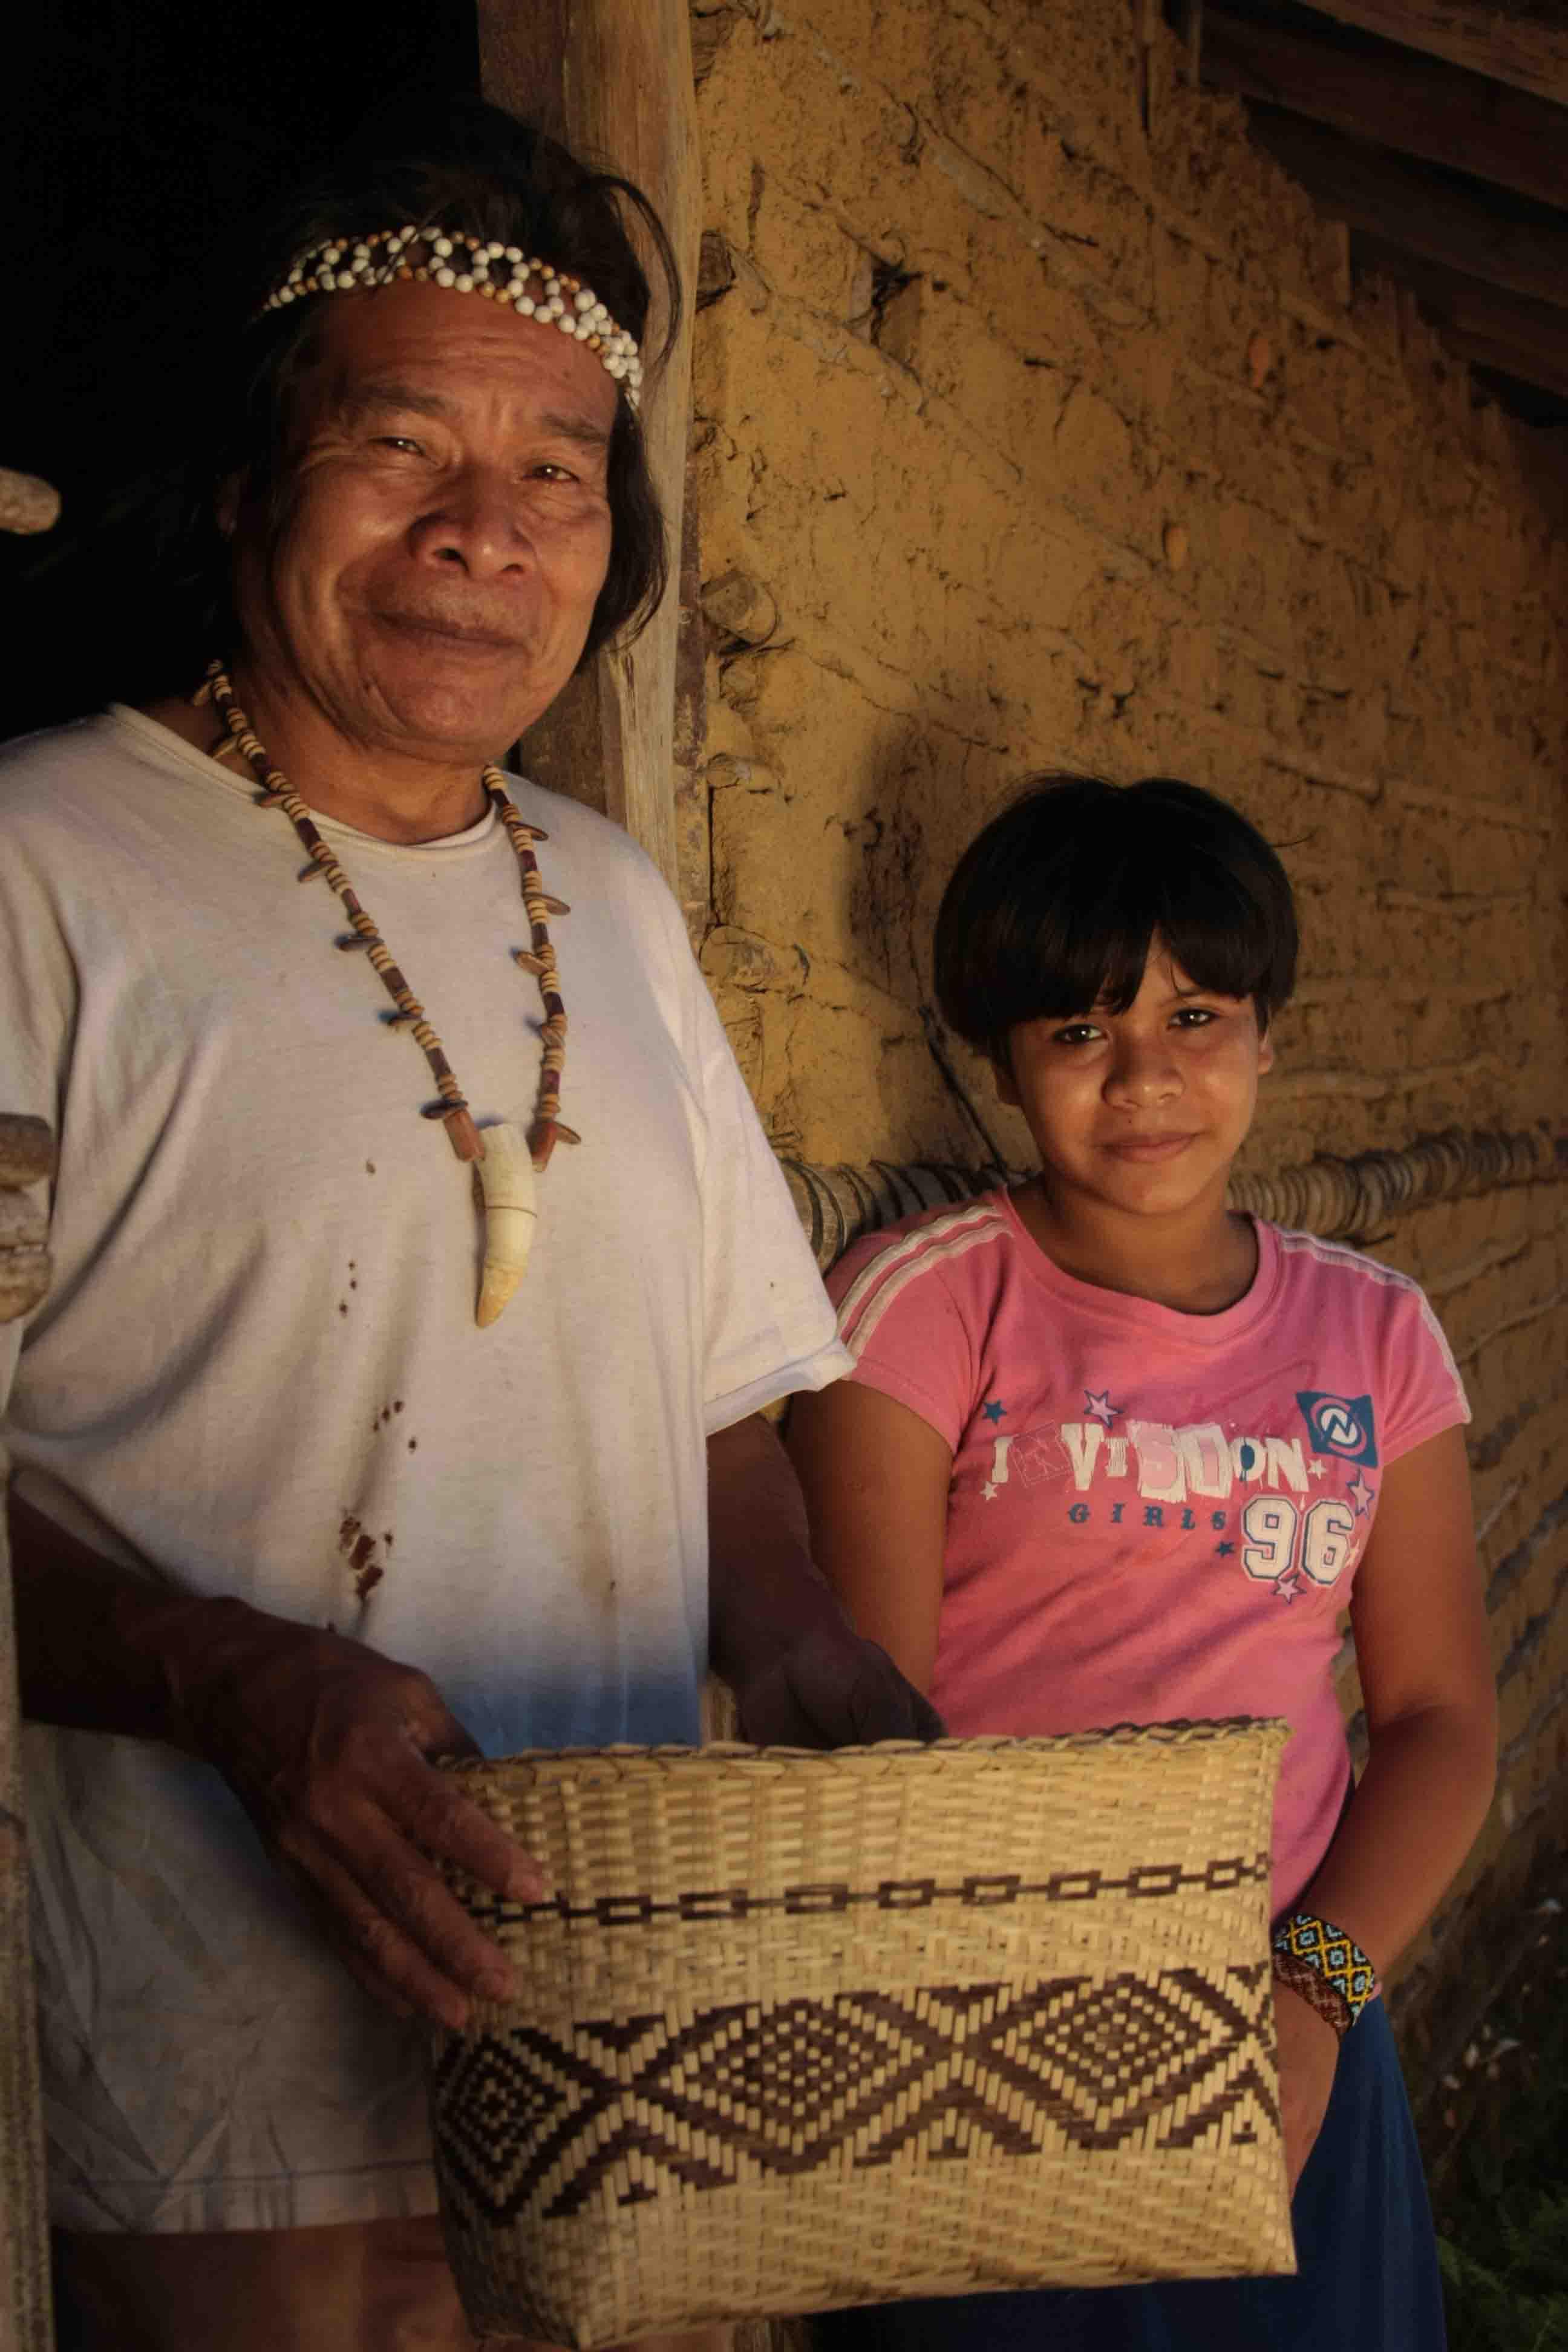 Ubatuba-cultura-comunidades-aldeia-boa-vista-691-bx